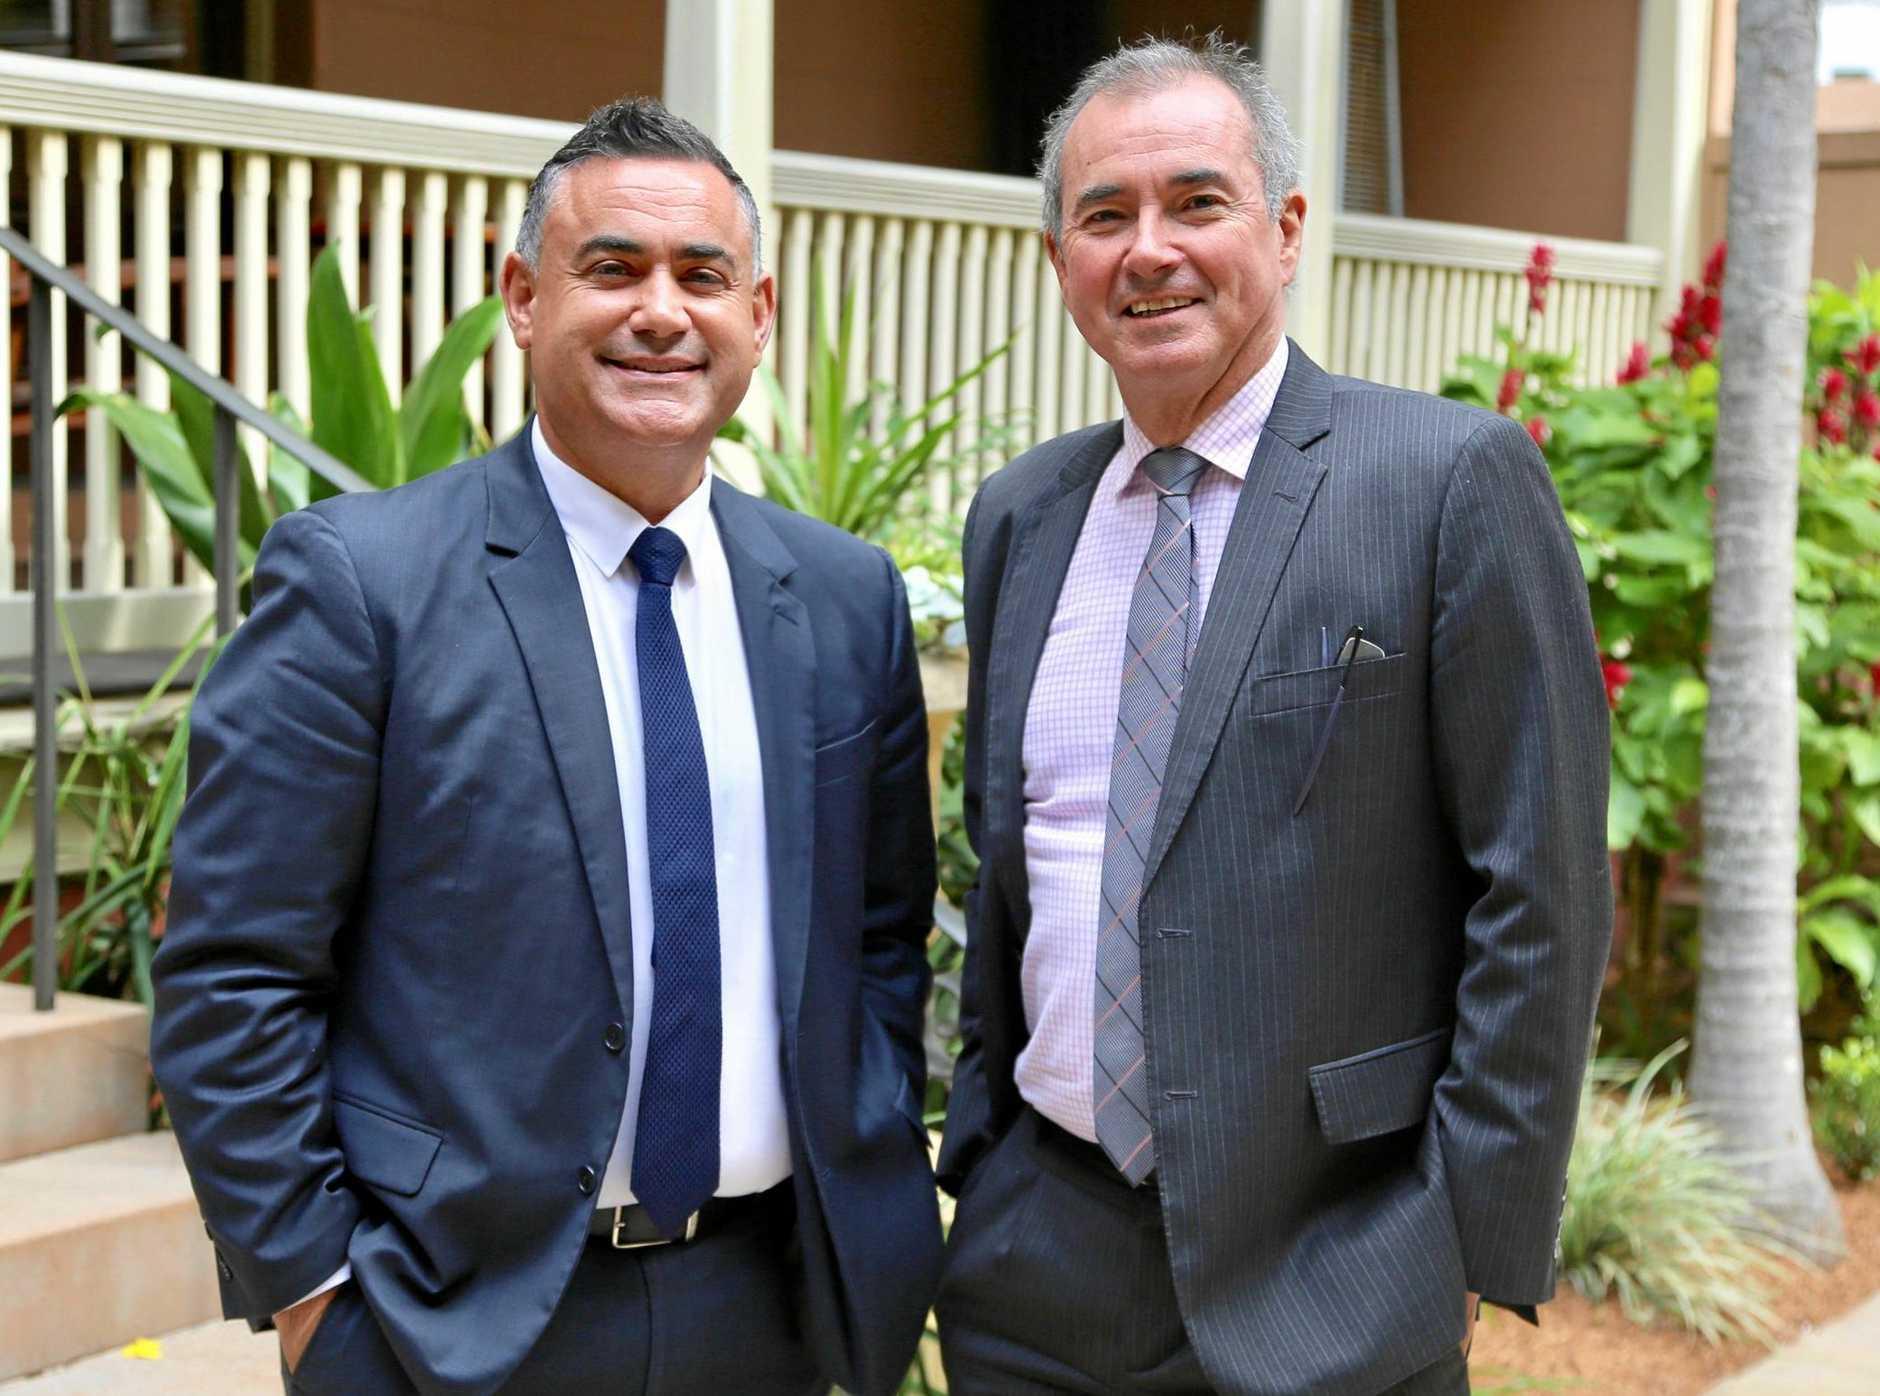 Deputy Premier John Barilaro and Member for Clarence Chris Gulaptis